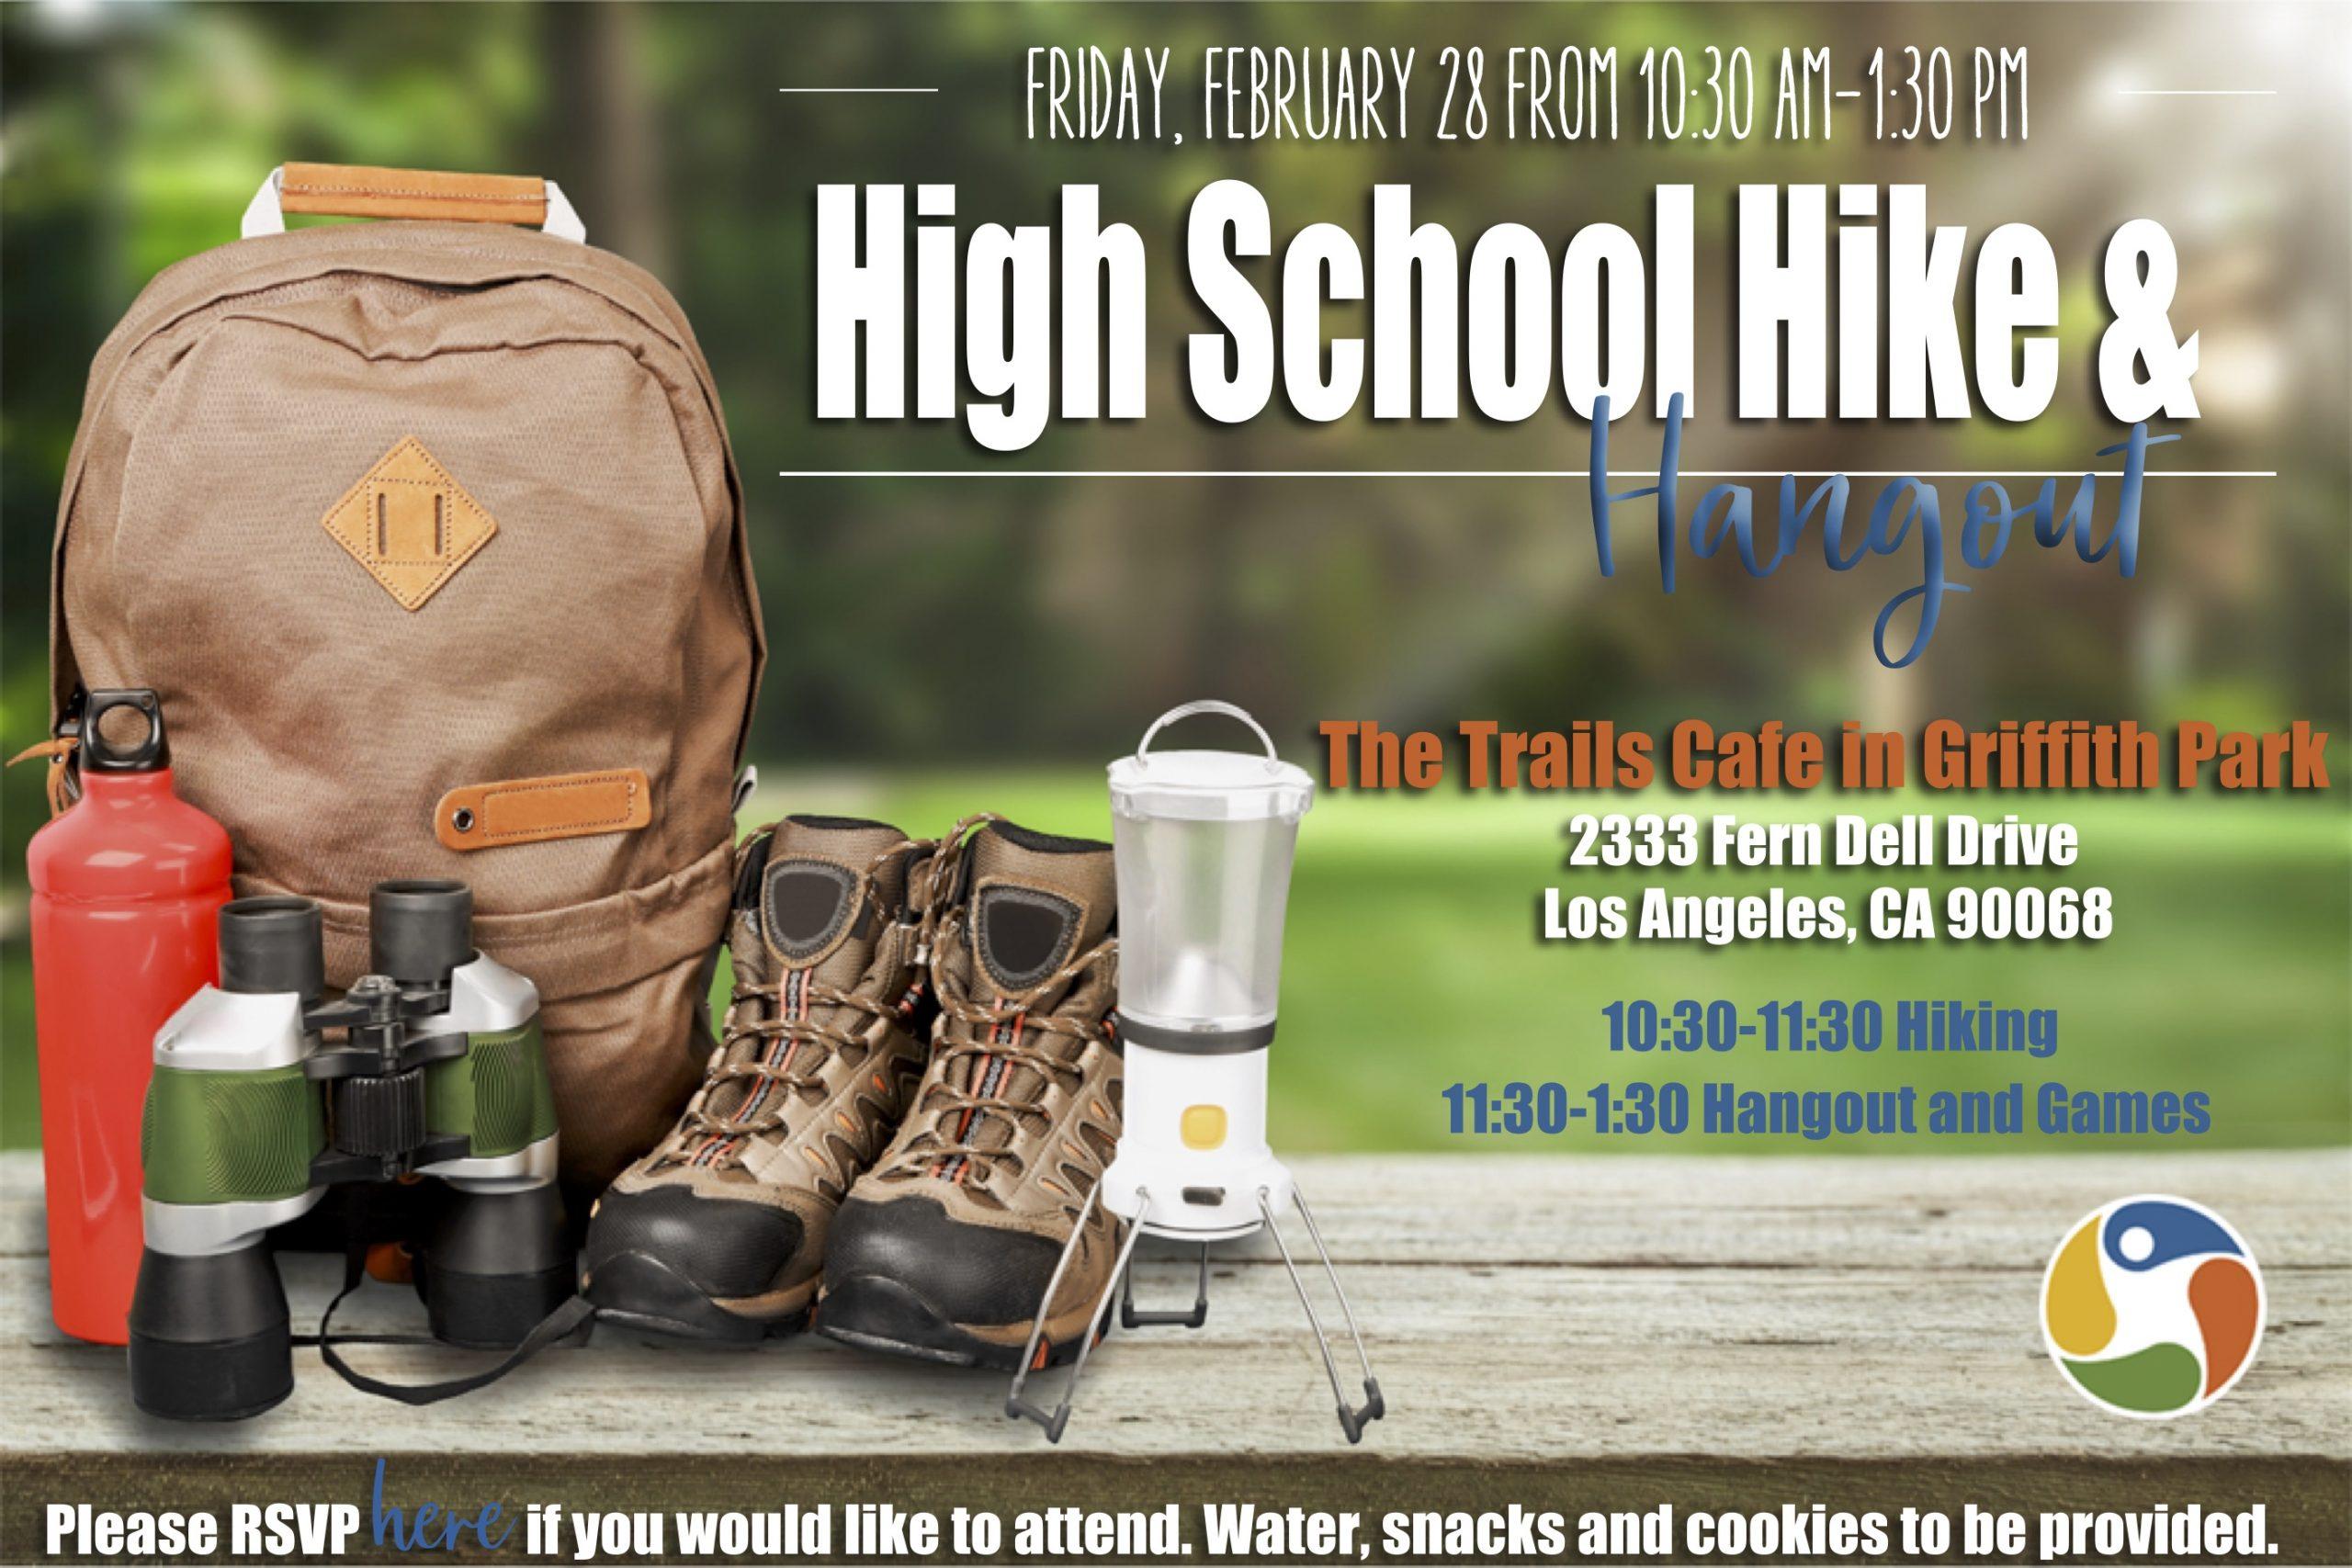 High School Hike and Hangout